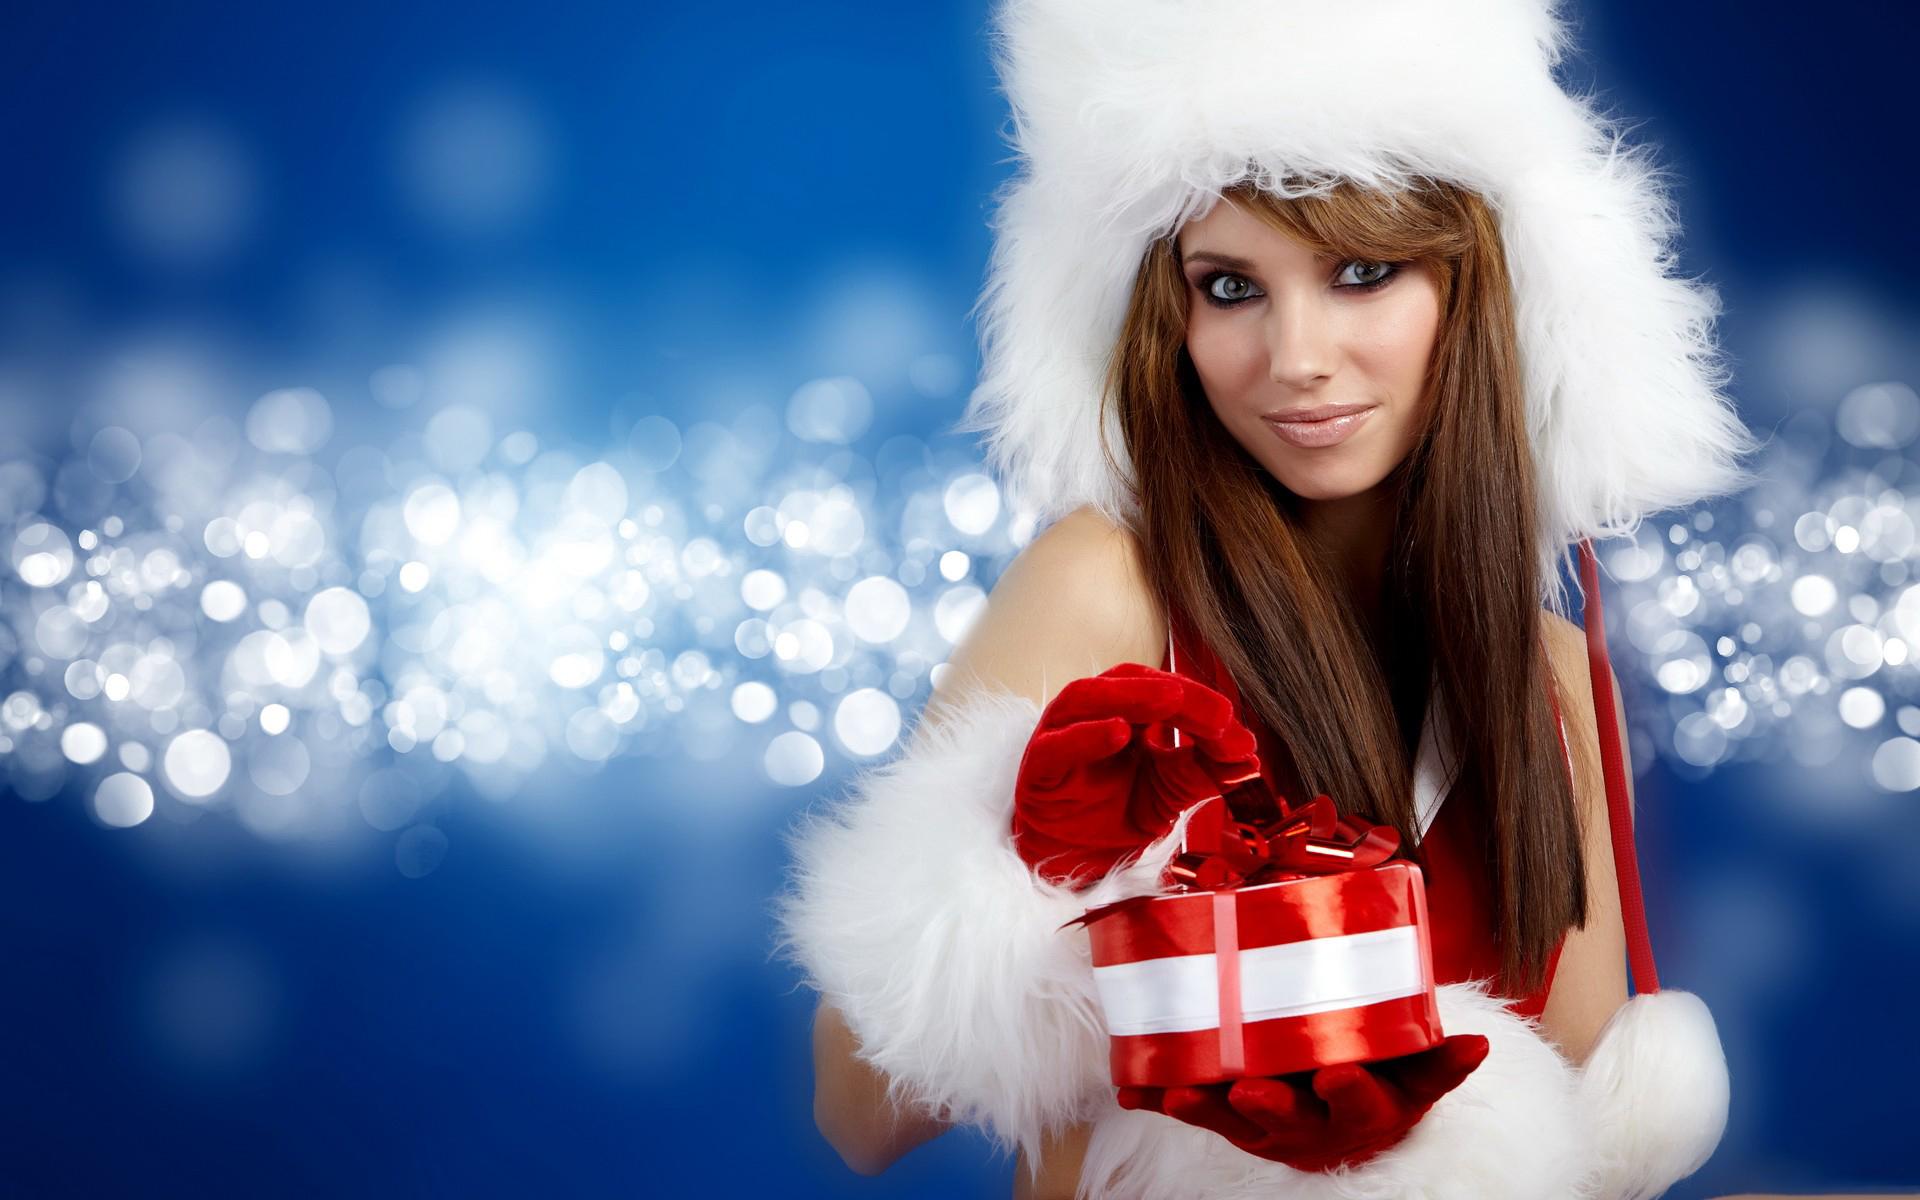 Christmas Girl High Definition Wallpaper 20784 - Baltana